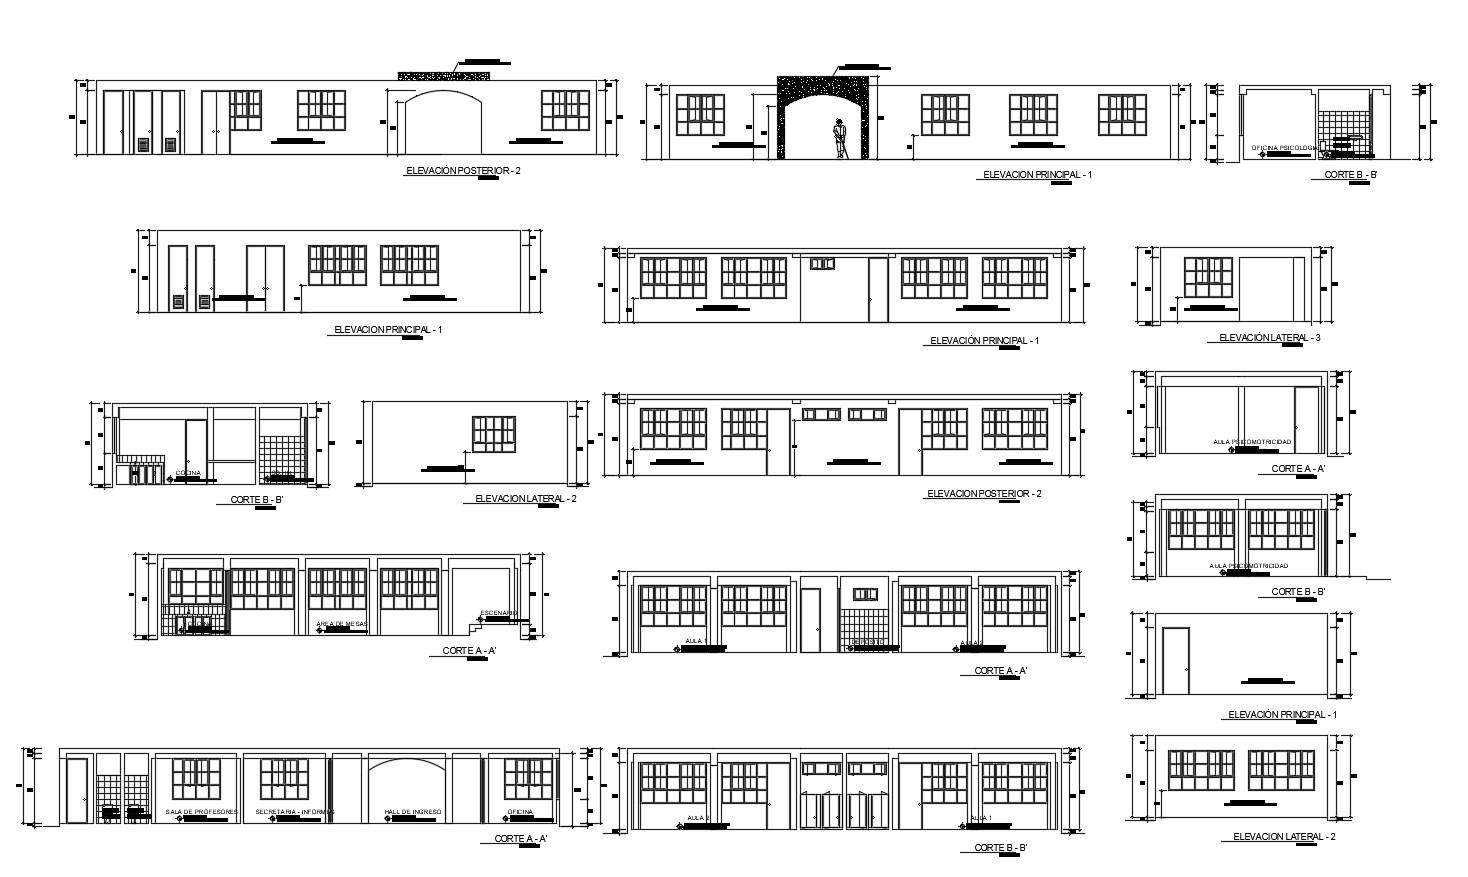 Elevation drawings of institute in dwg file